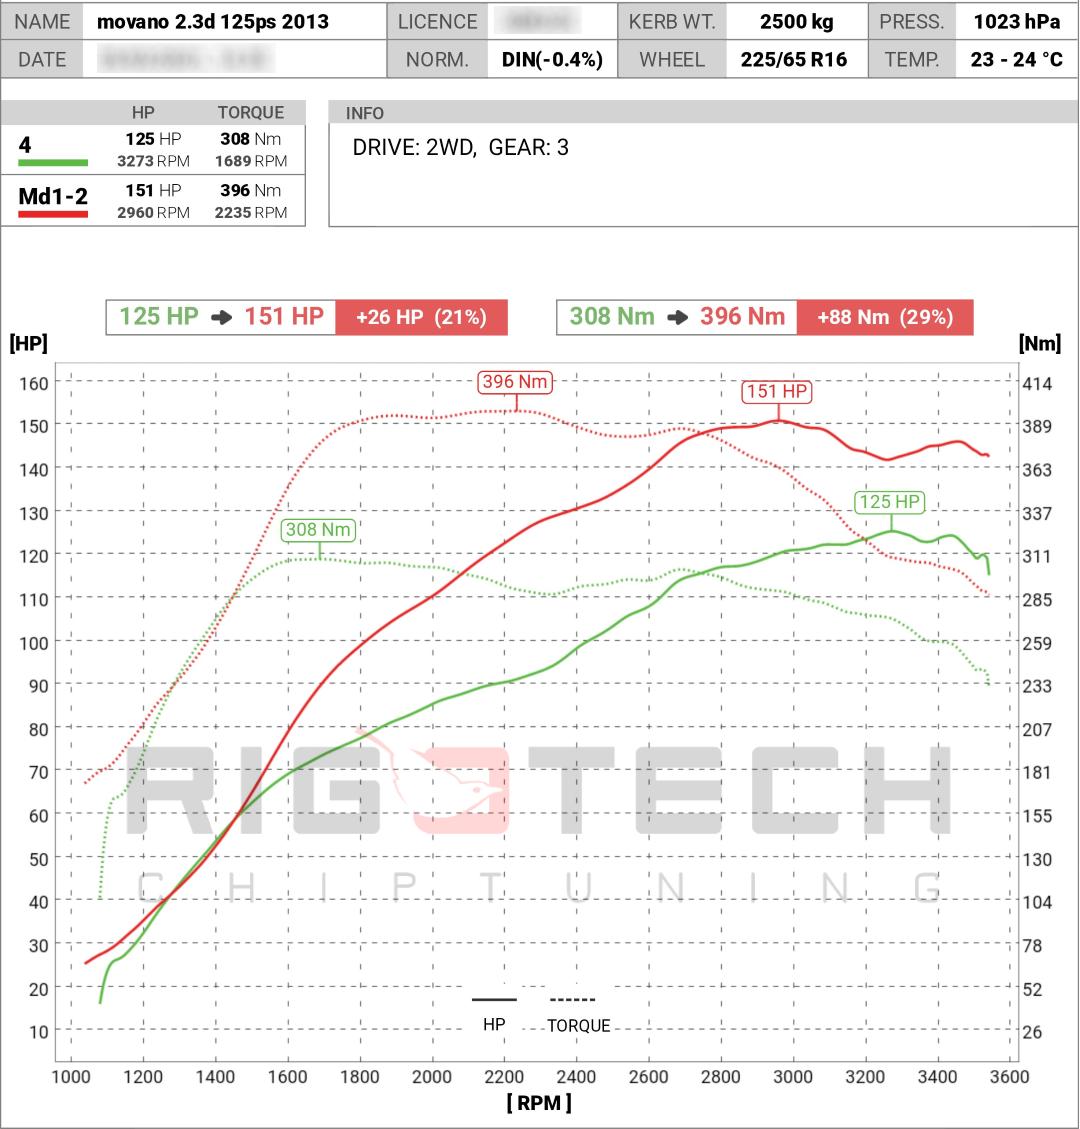 opel-Movano-tuning-teljesitmenymeres-dyno-chart